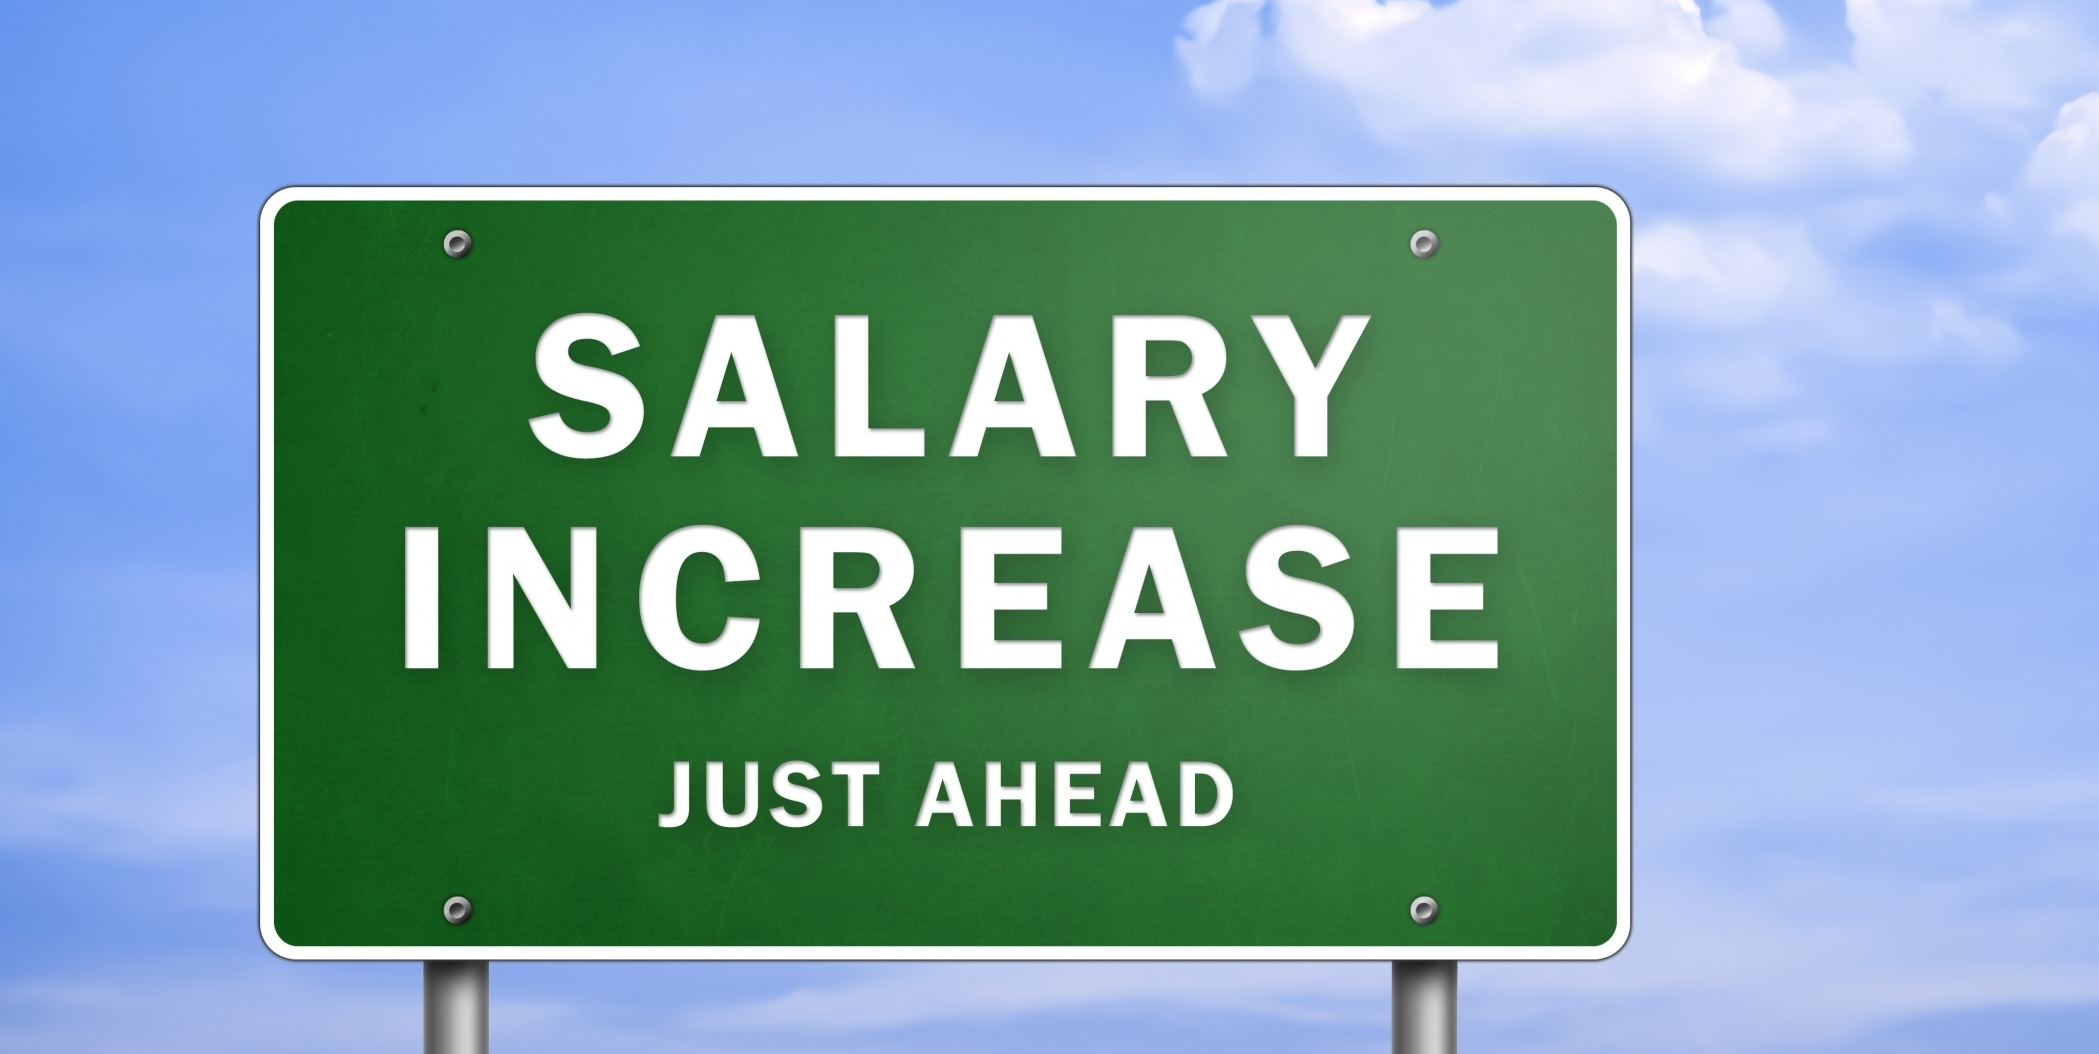 Road sign reading salary increase ahead